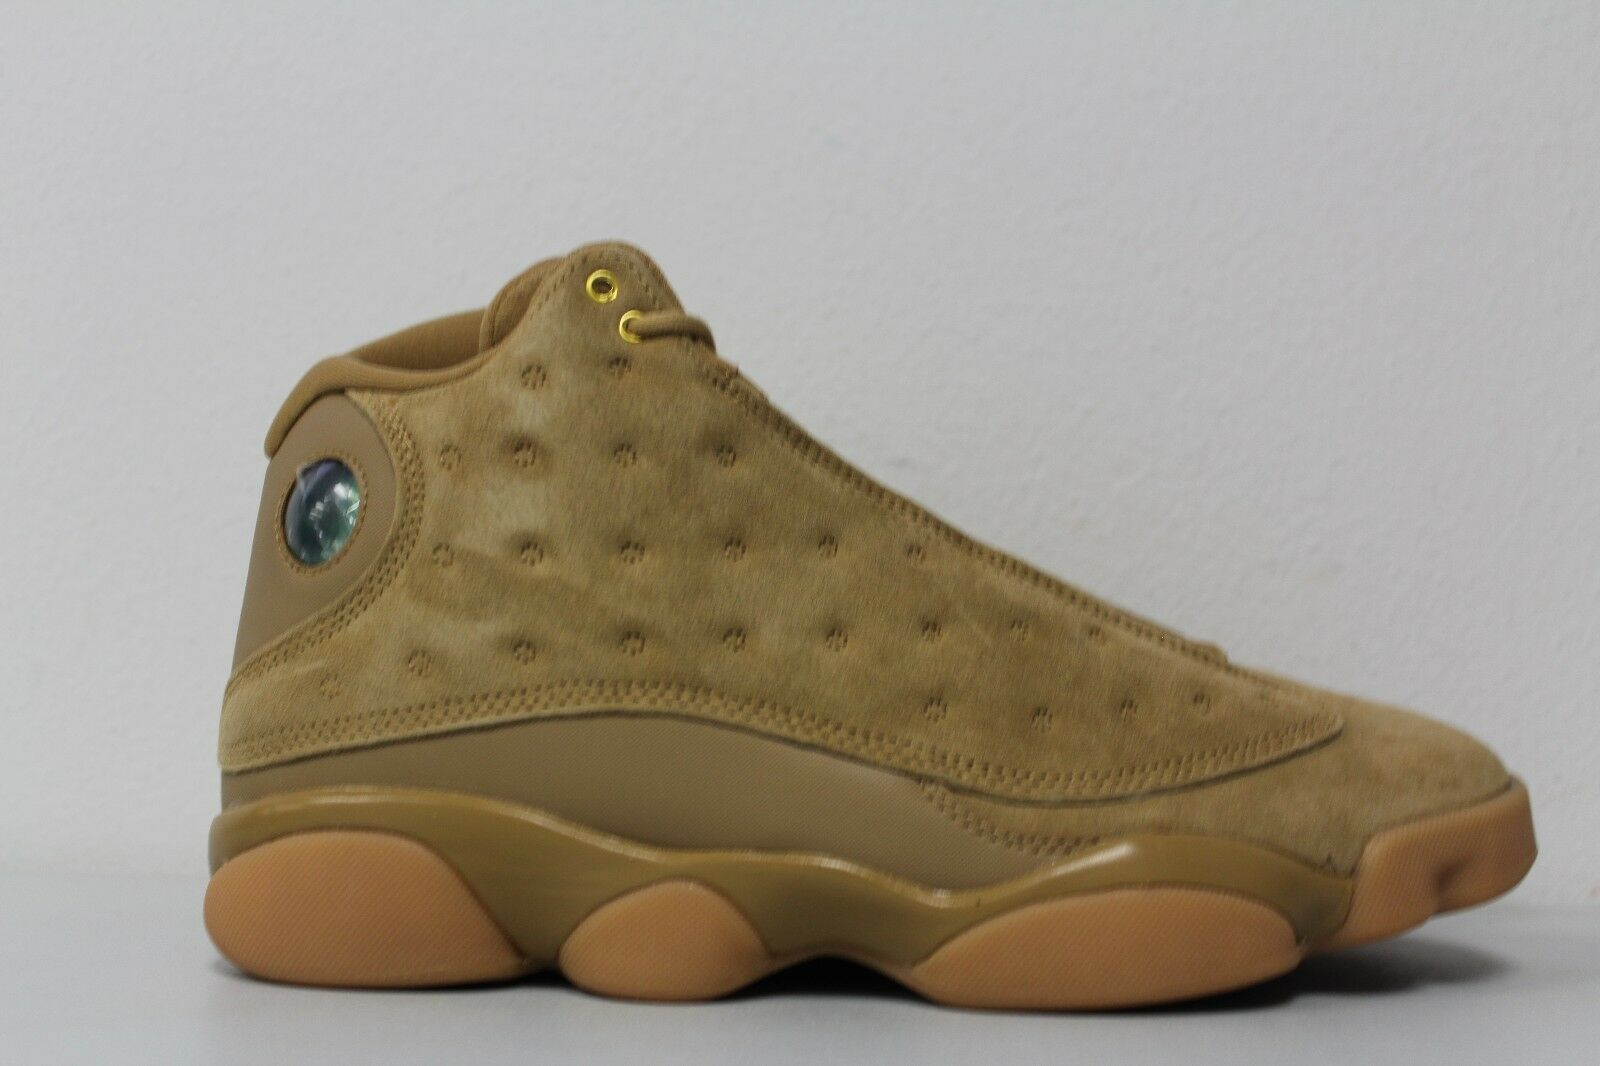 Nike Mens Air Jordan 13 Retro Size 12 Wheat Element Gold Brown Flax 414571-705